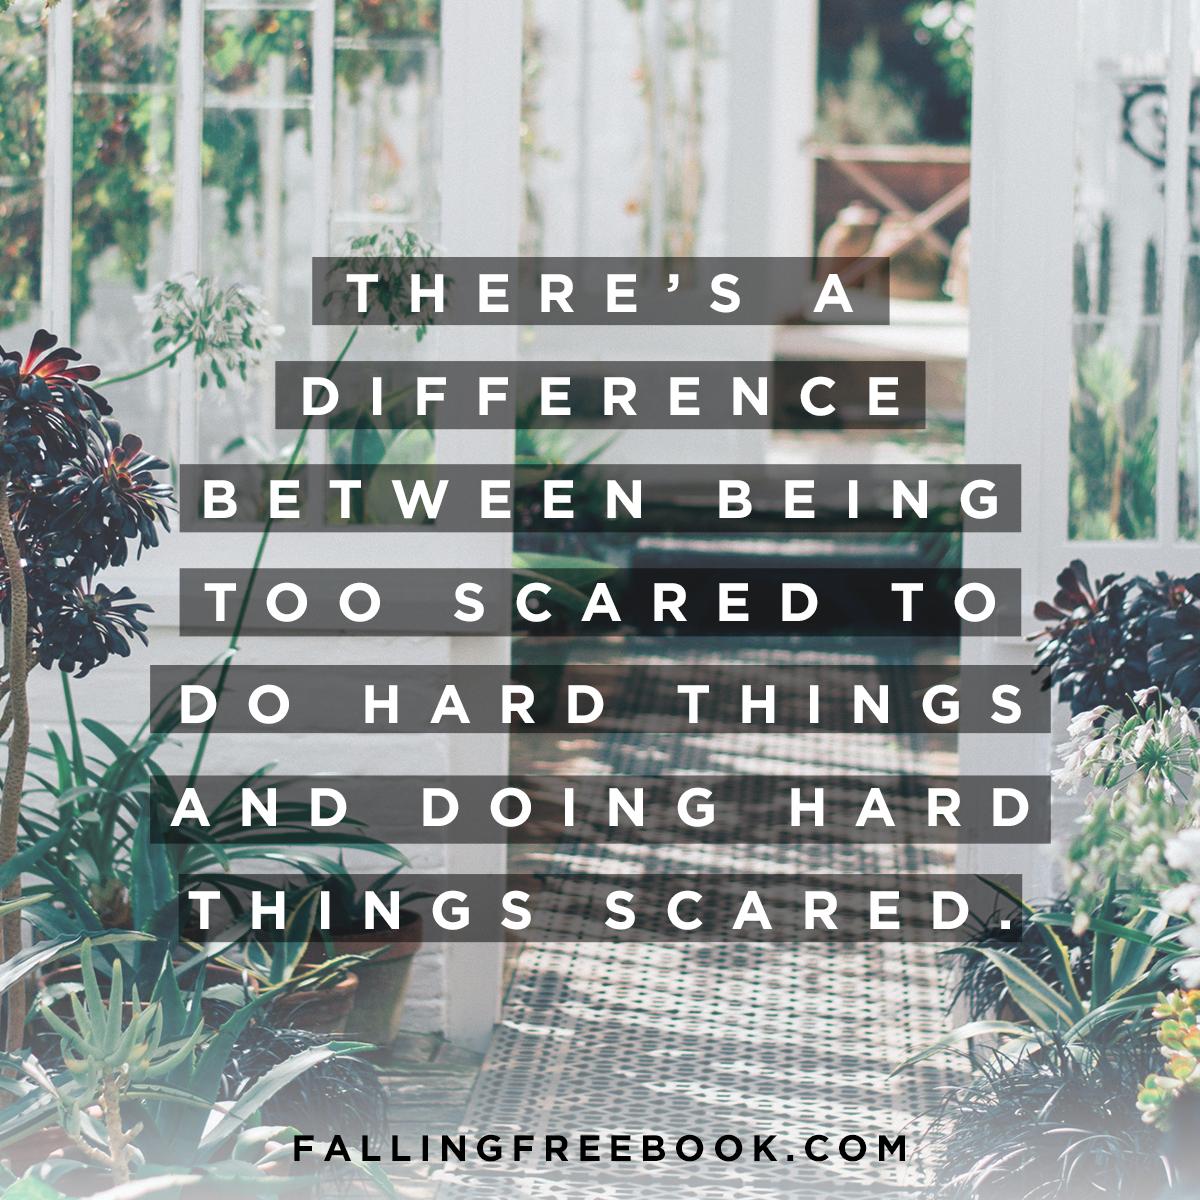 FallingFree_meme_scared.png